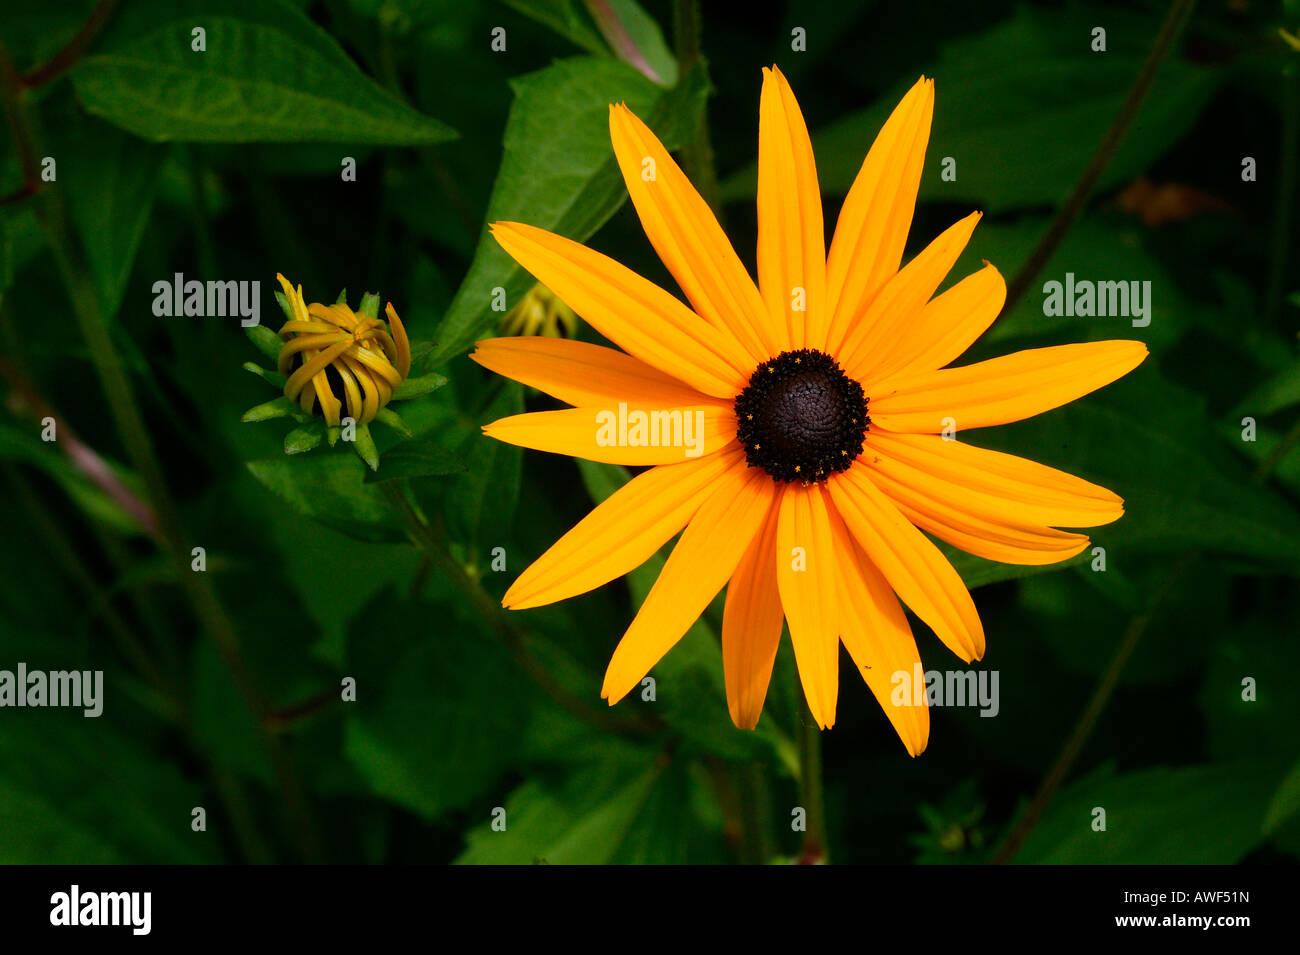 Black-Eyed Susan (Rudbeckia fulgida var. sullivantii) - Stock Image